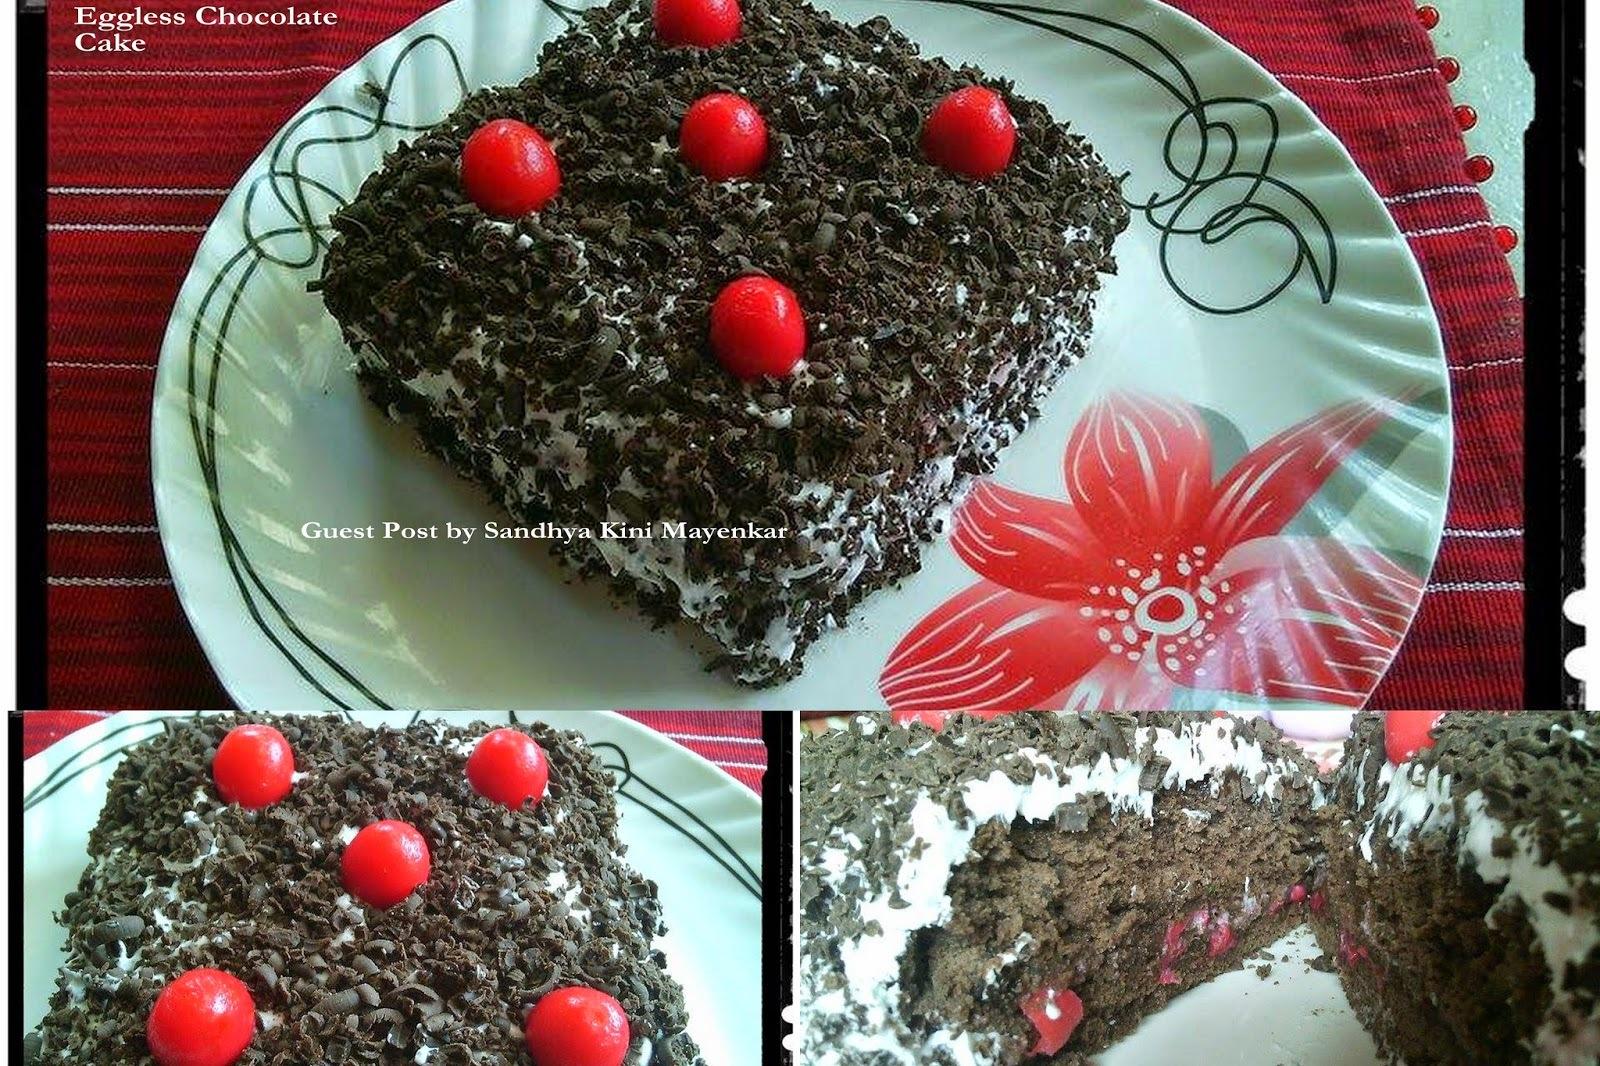 EGGLESS CHOCOLATE CAKE: GUEST POST BY SANDHYA KINI MAYENKAR